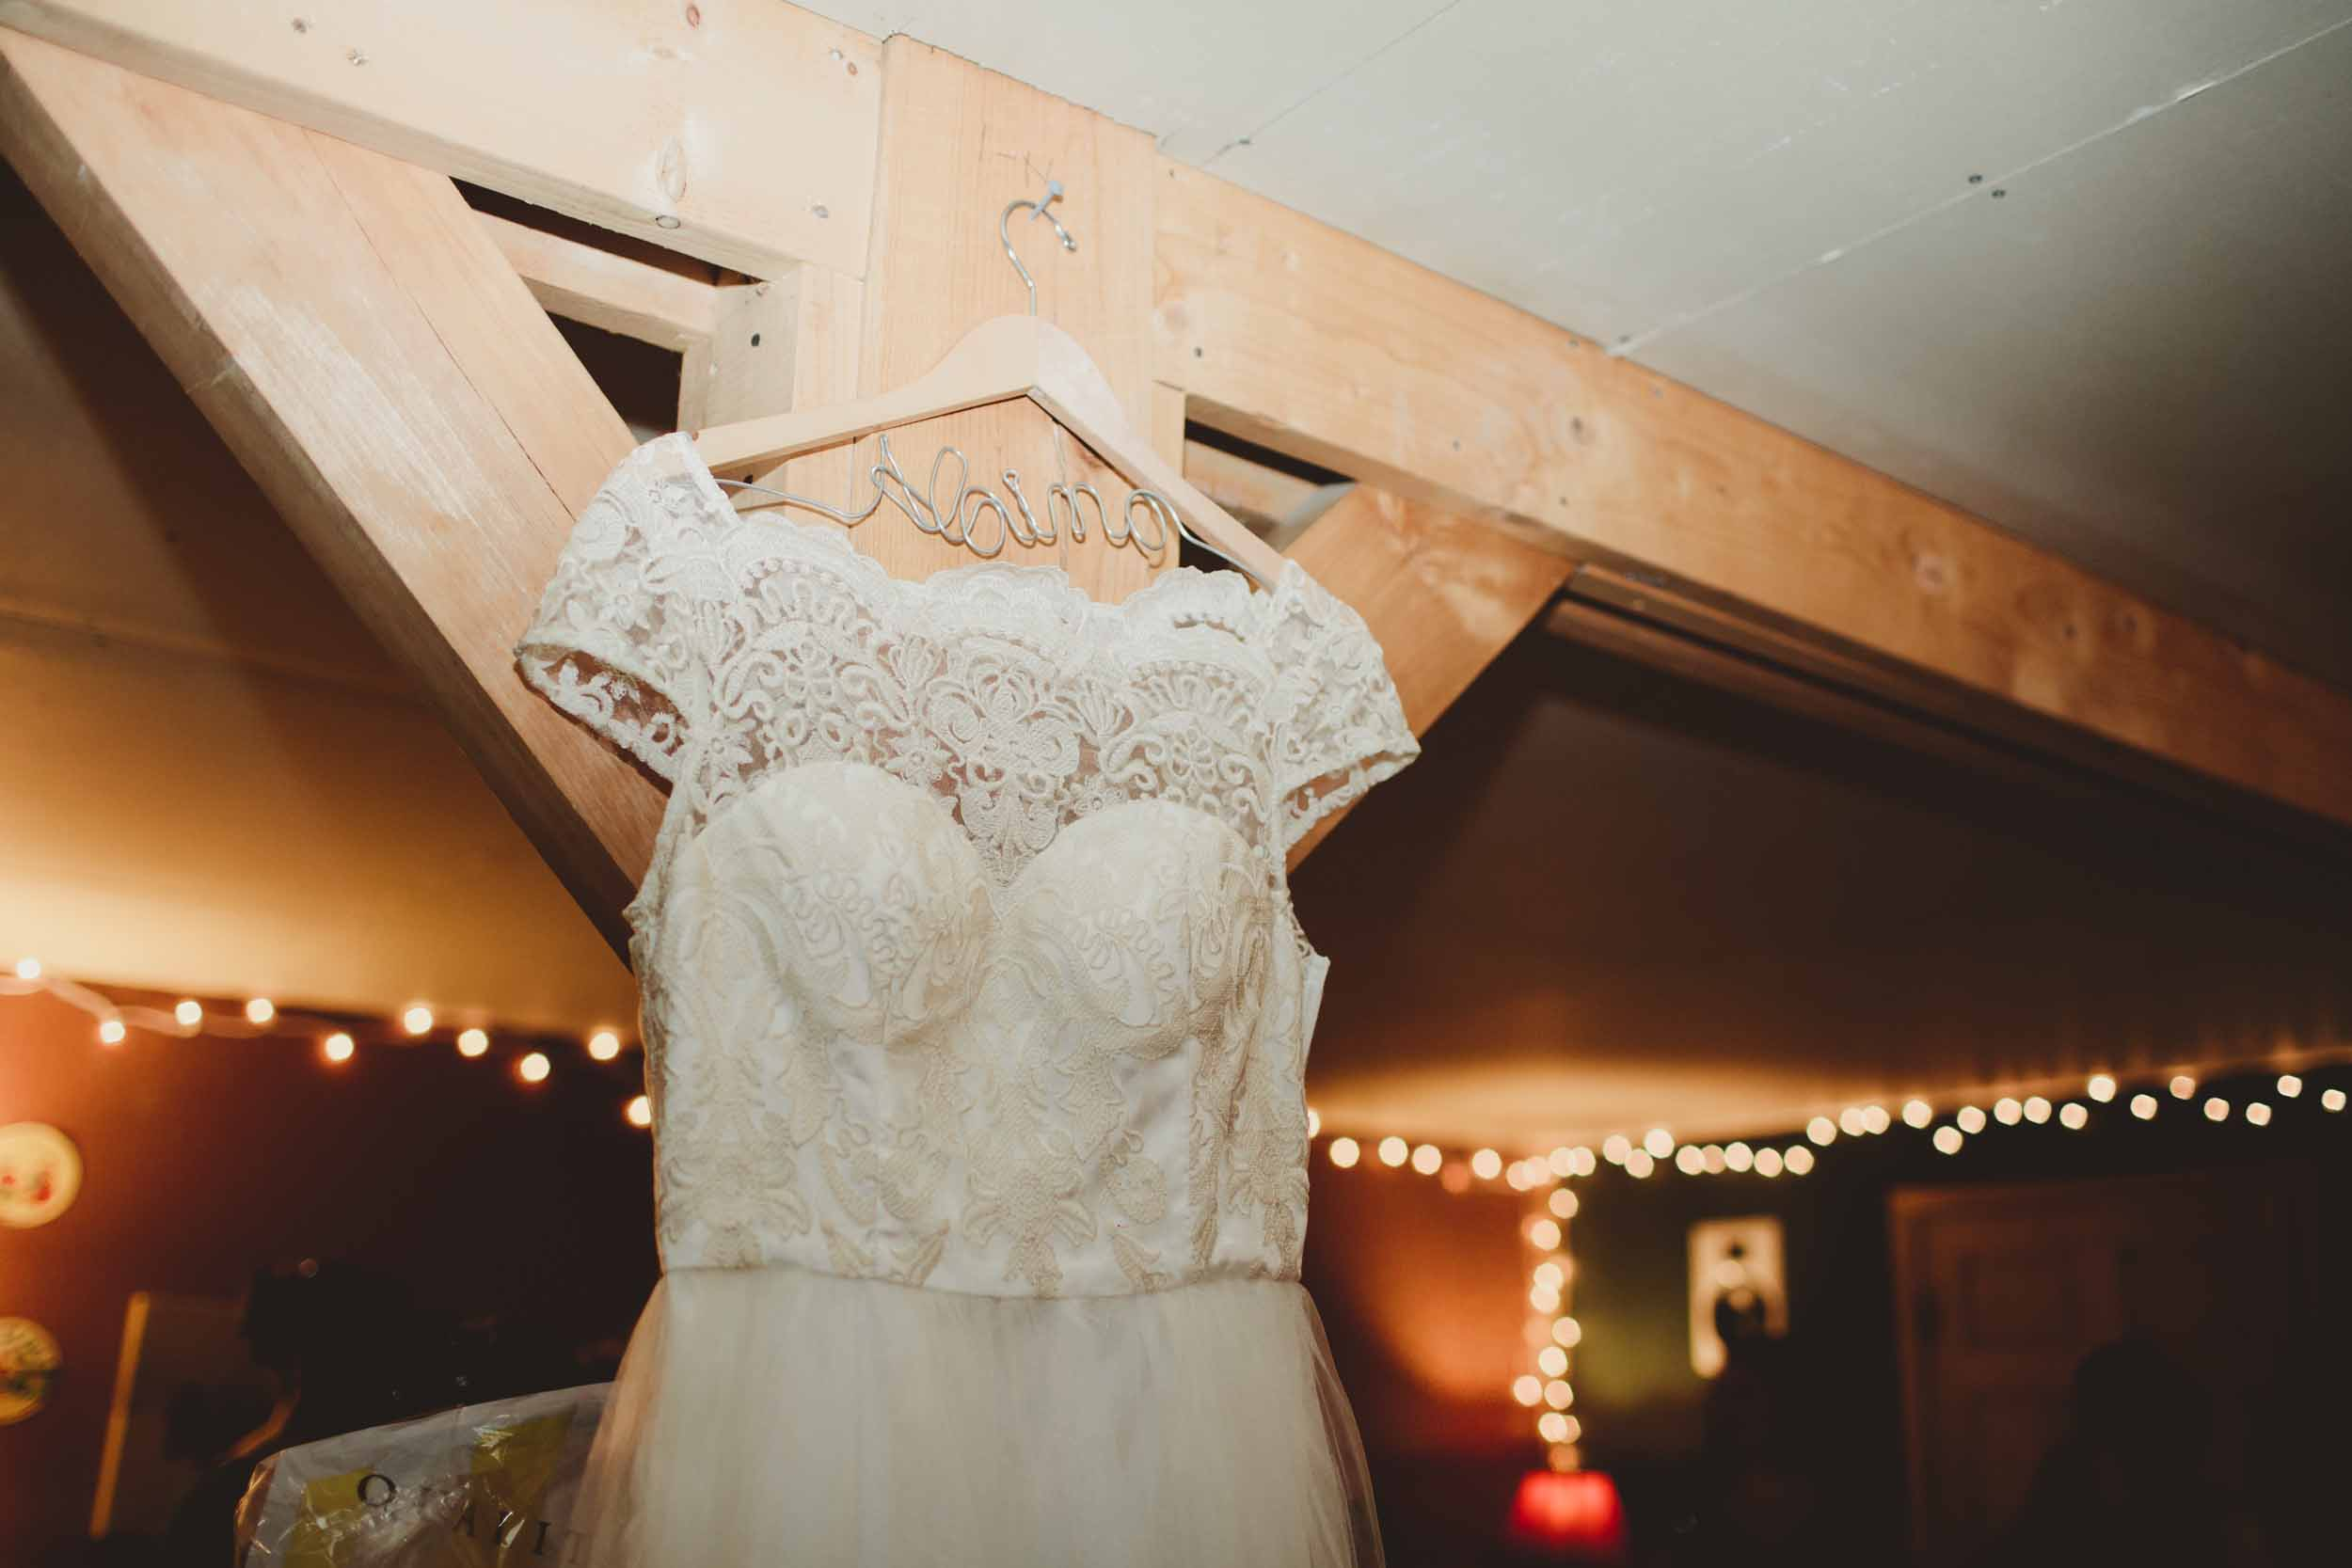 Stone-mountain-arts-wedding5.jpg